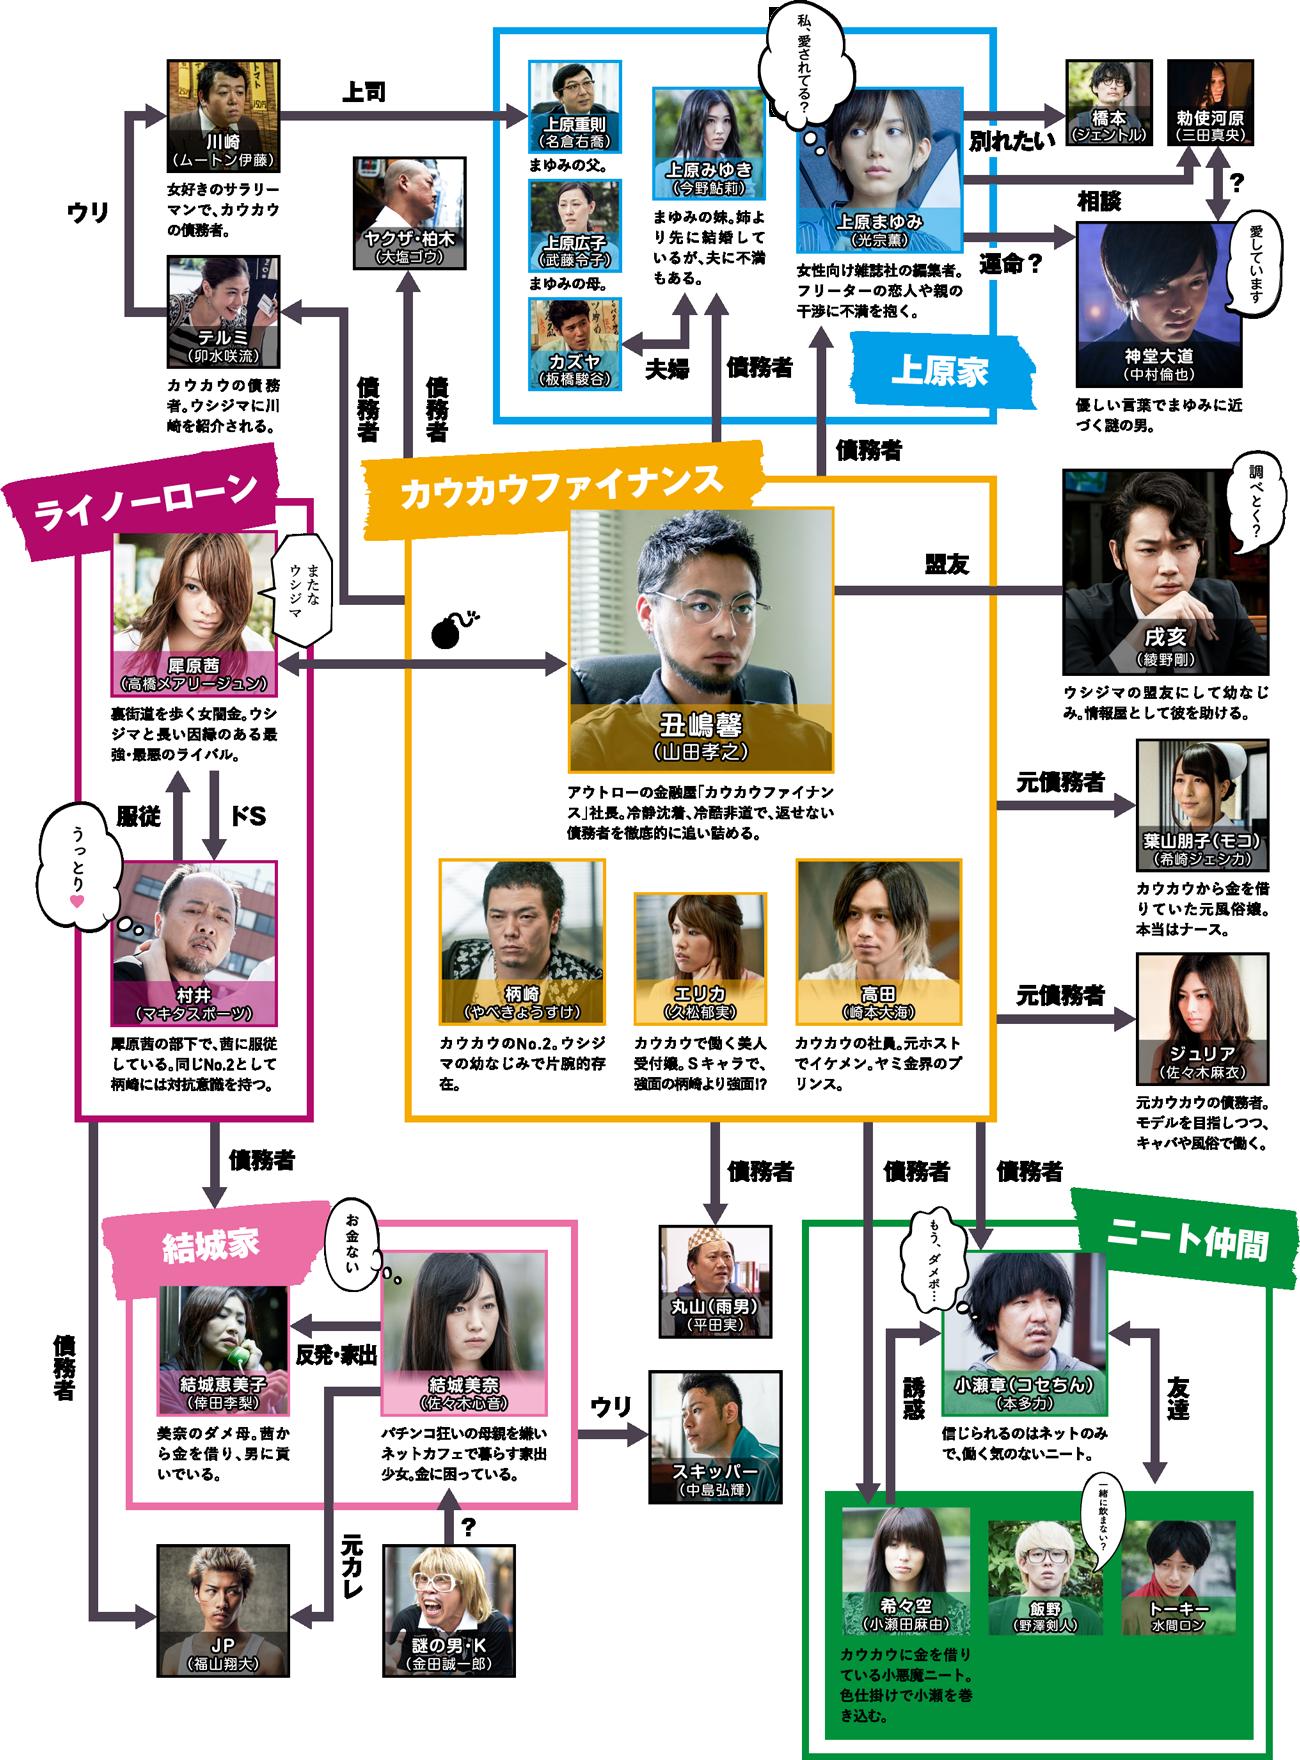 character_photos